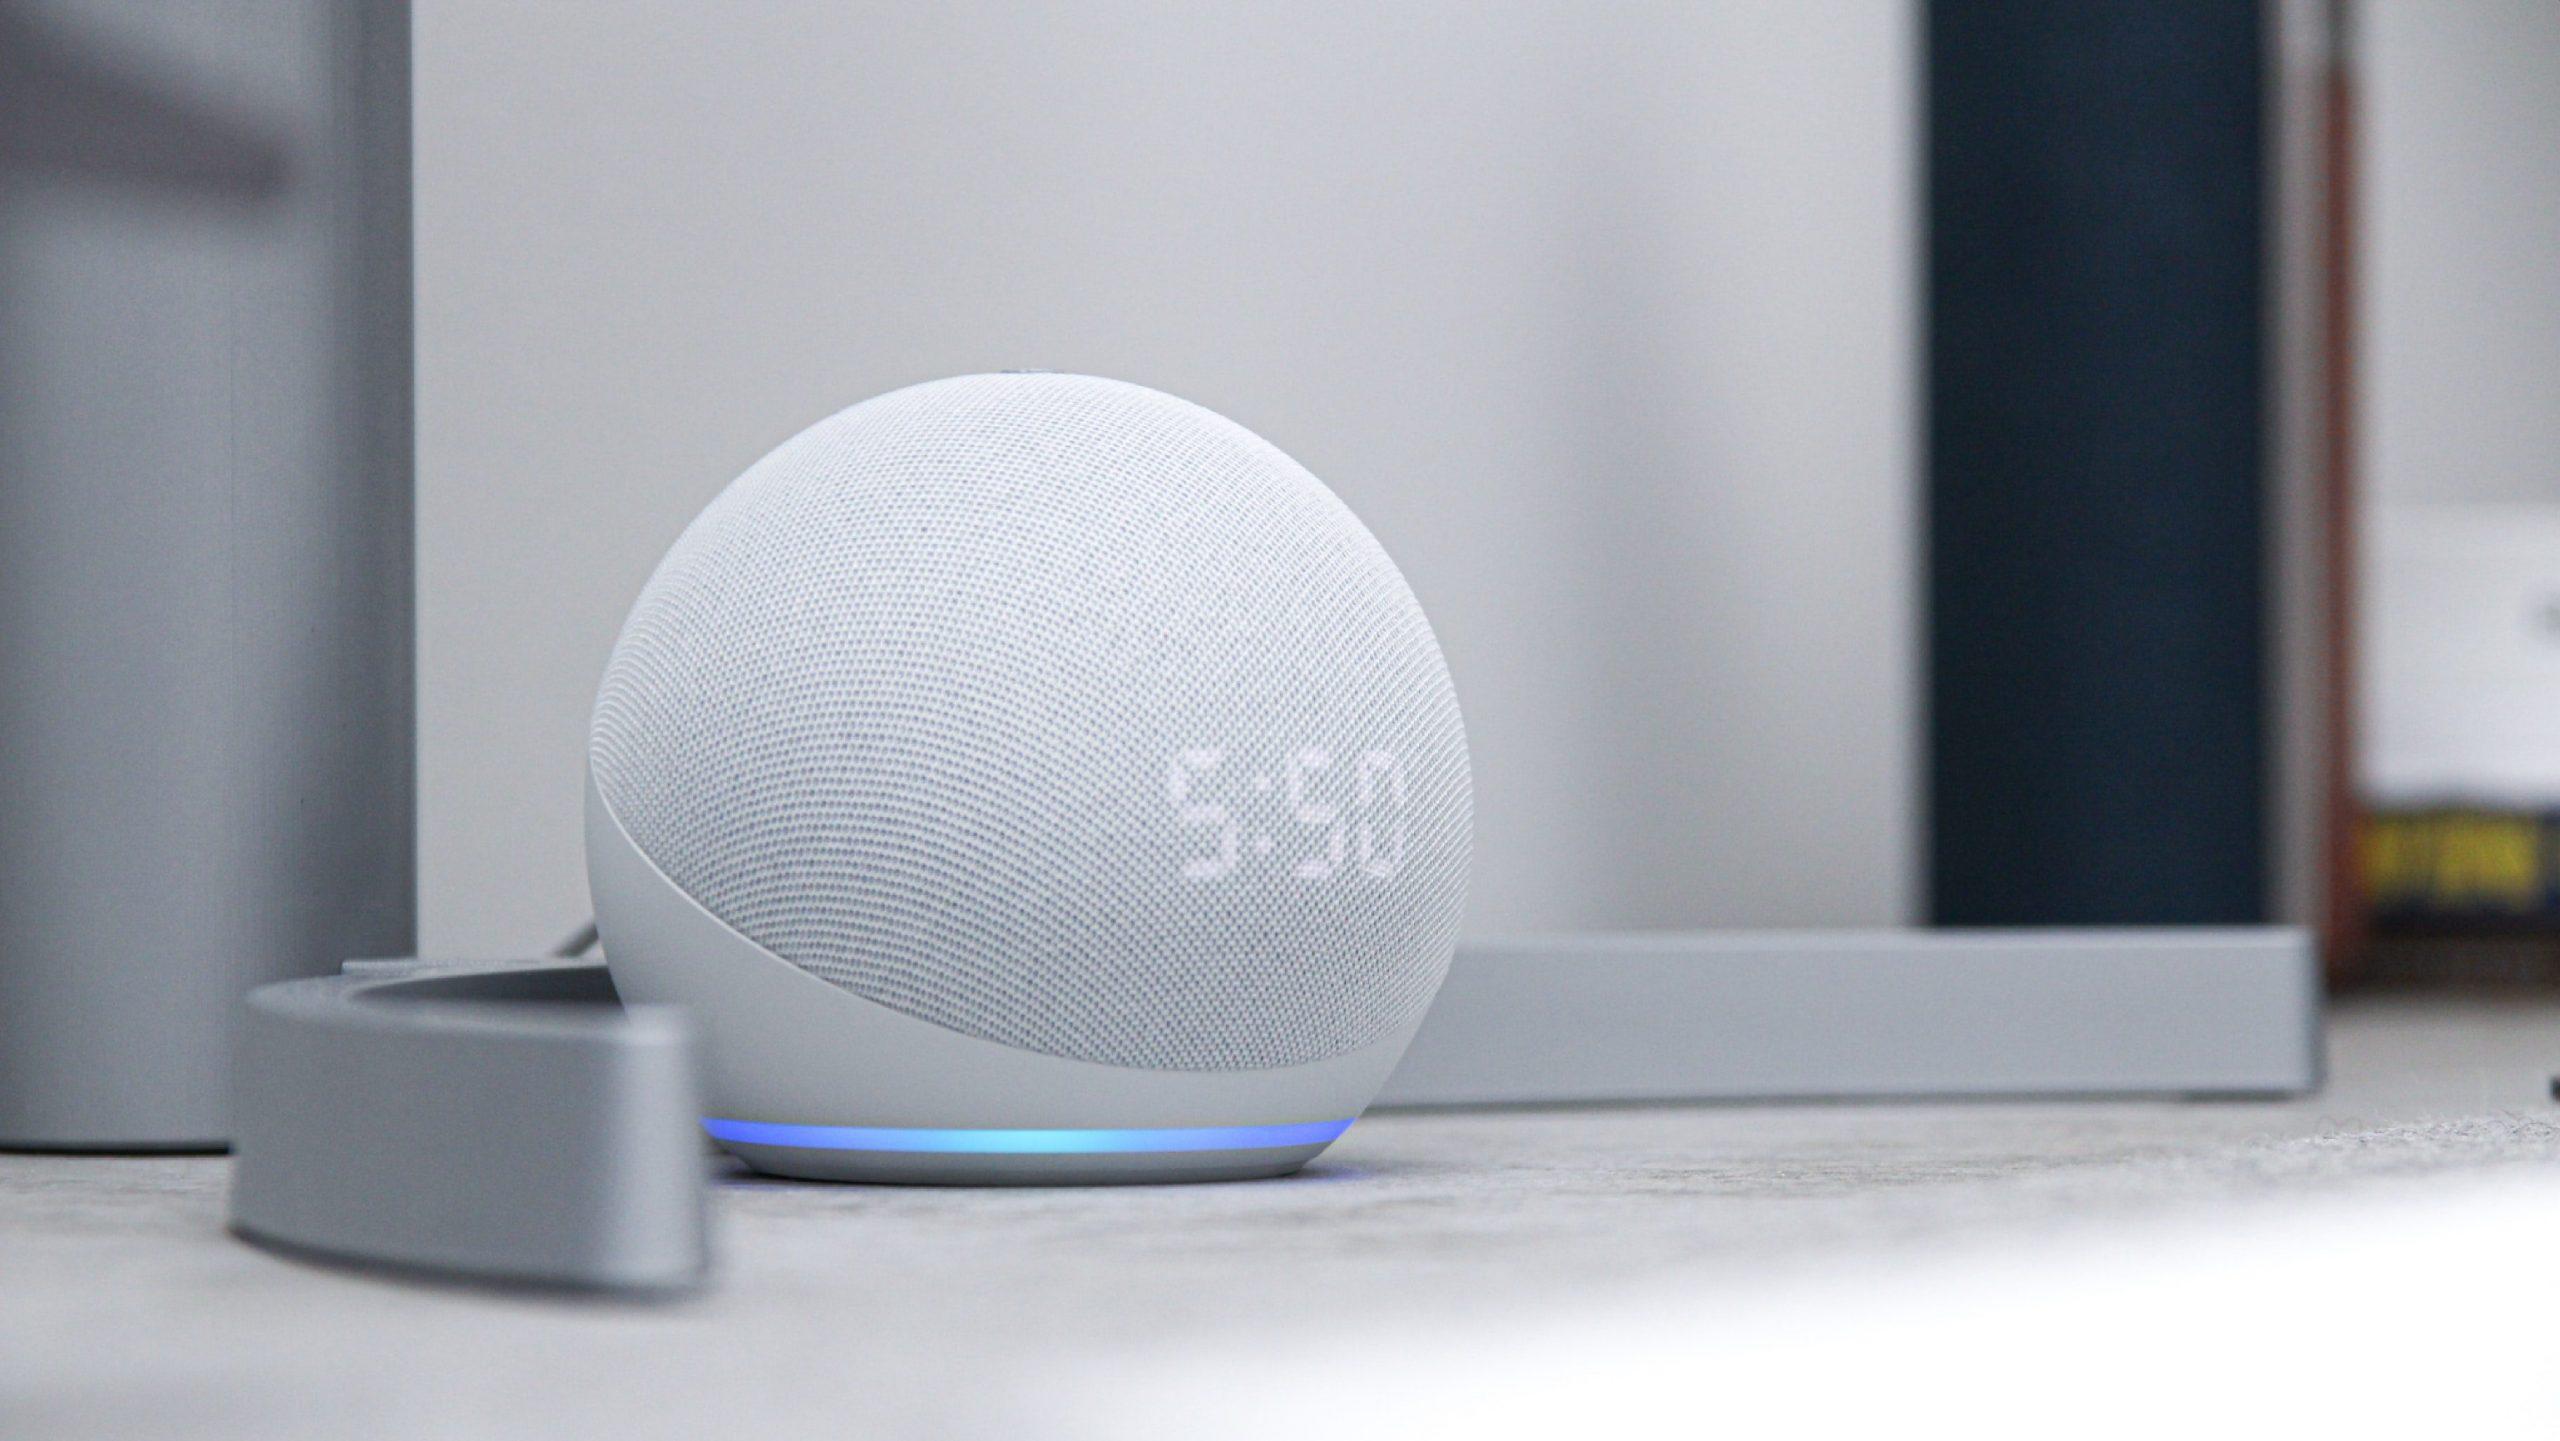 Amazon Alexa 4th Generation